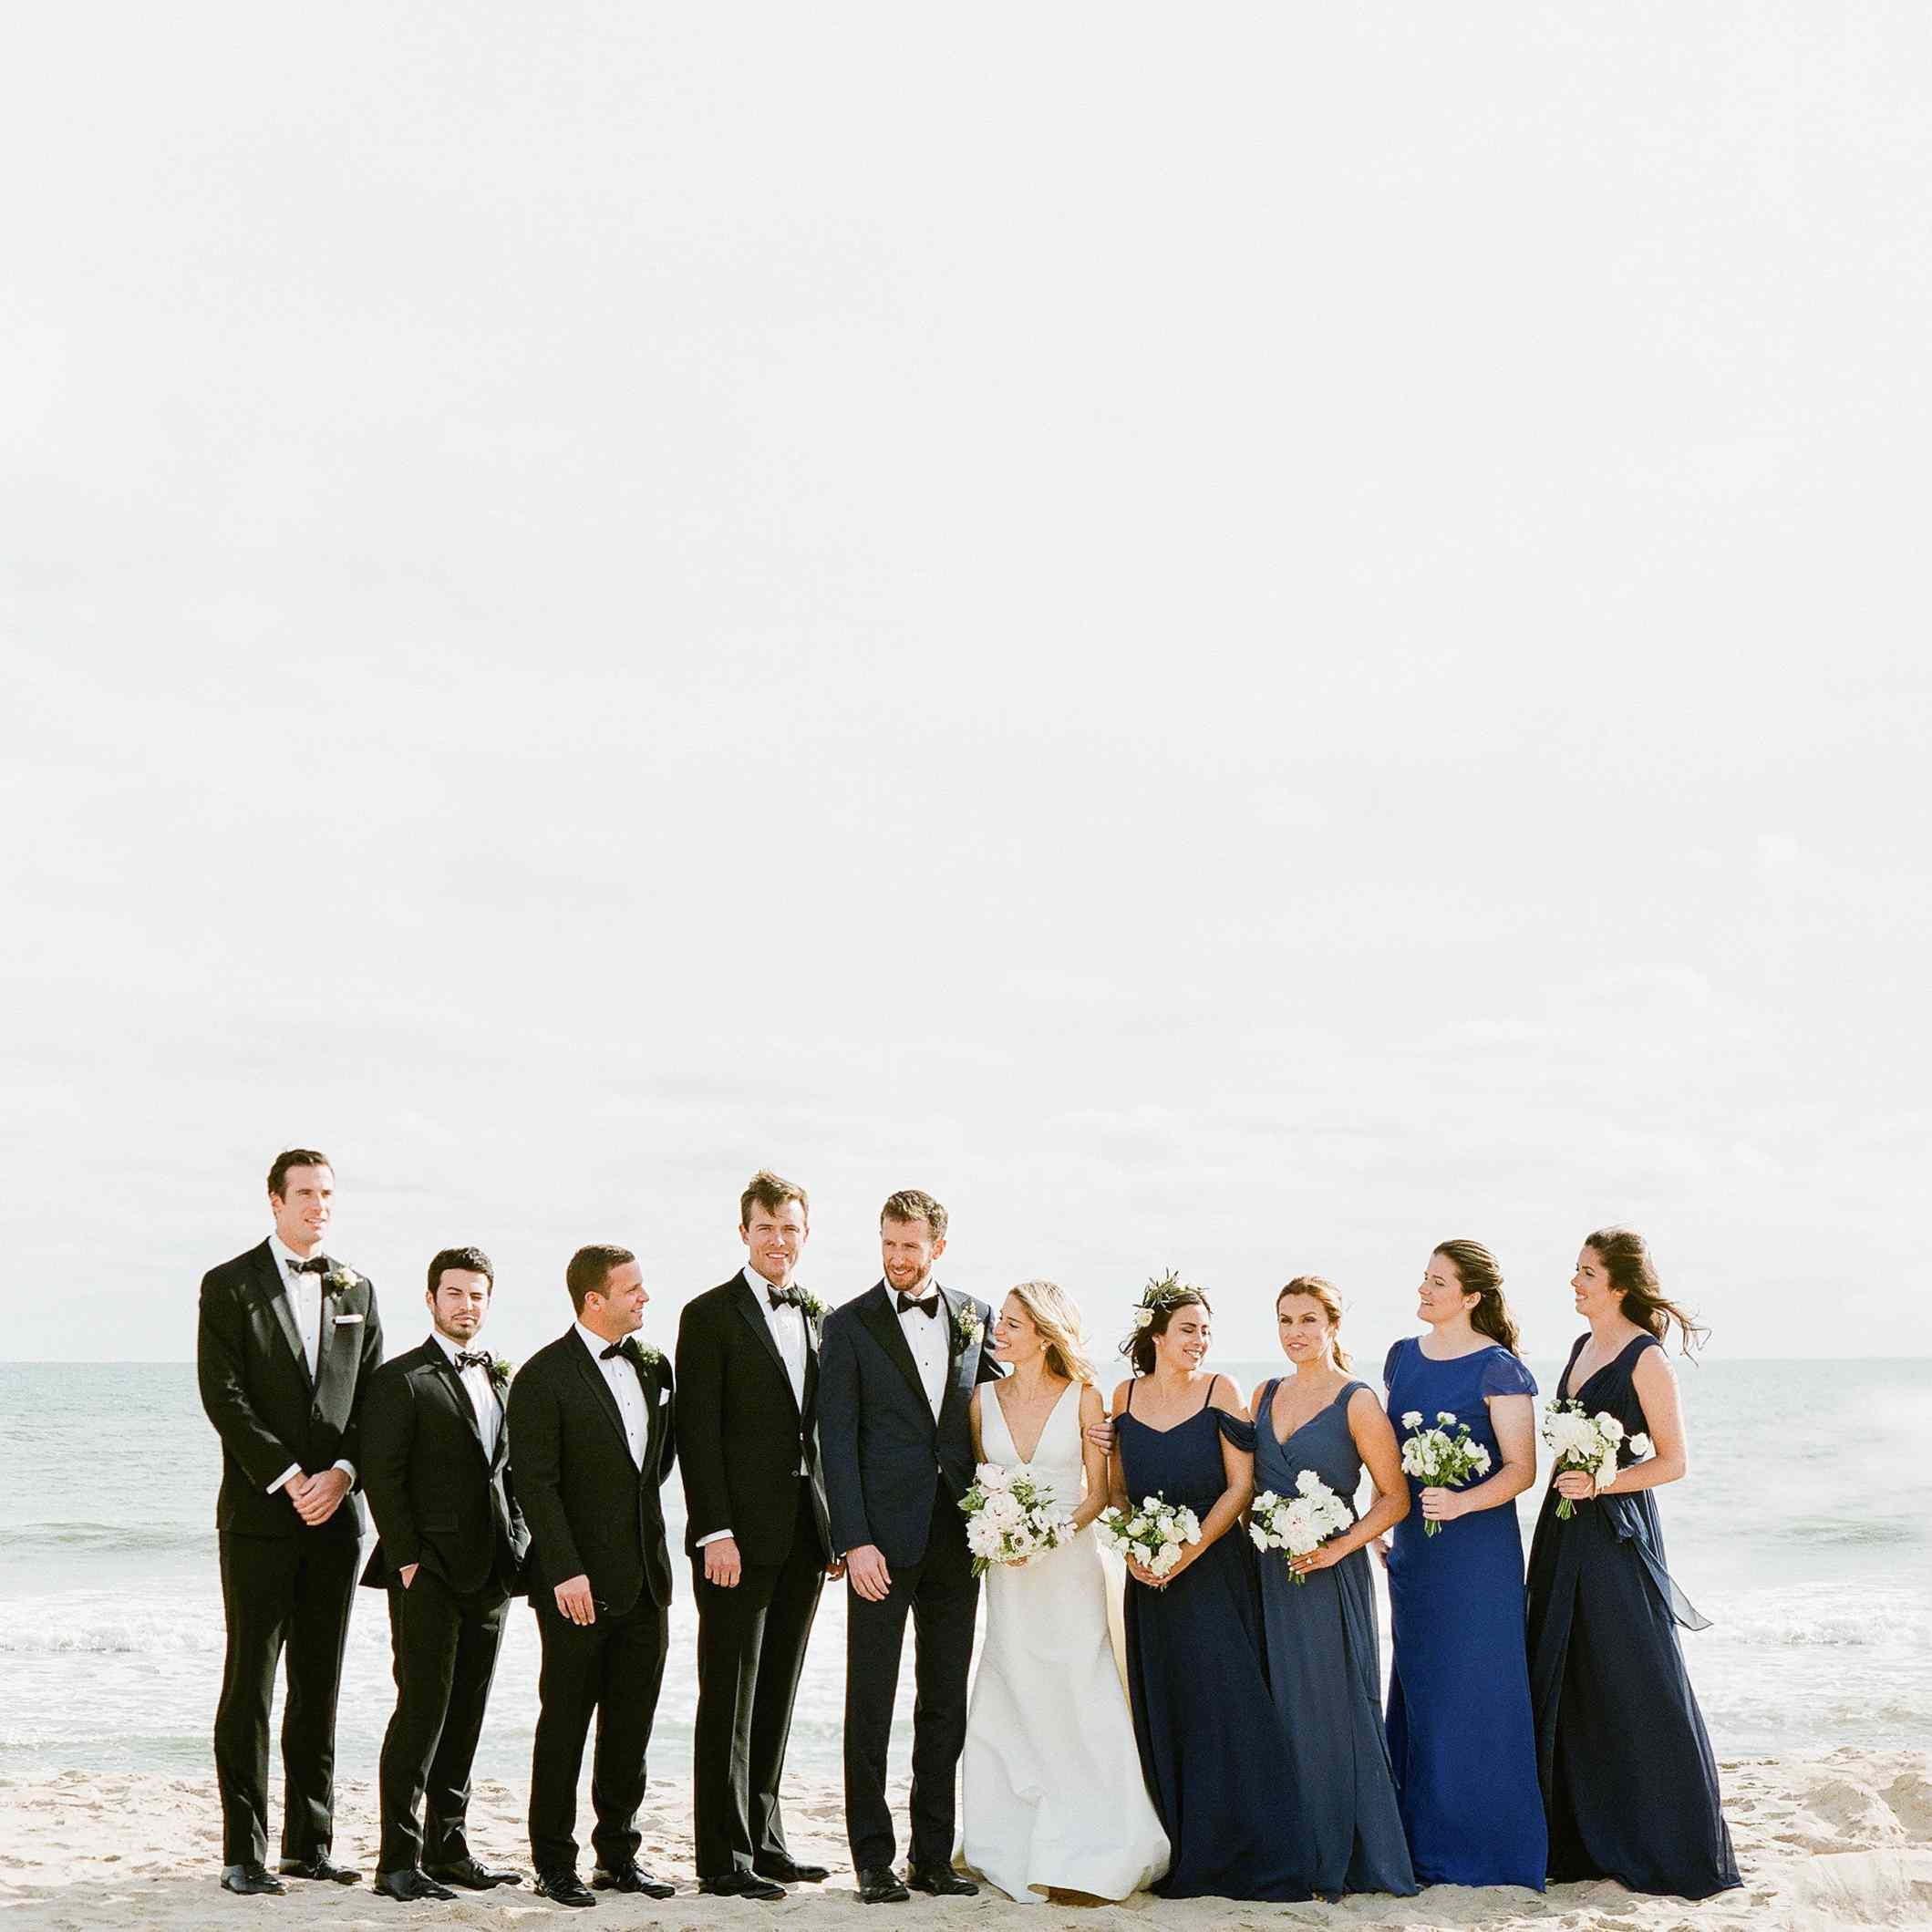 <p>bridal party photos on beach</p><br><br>